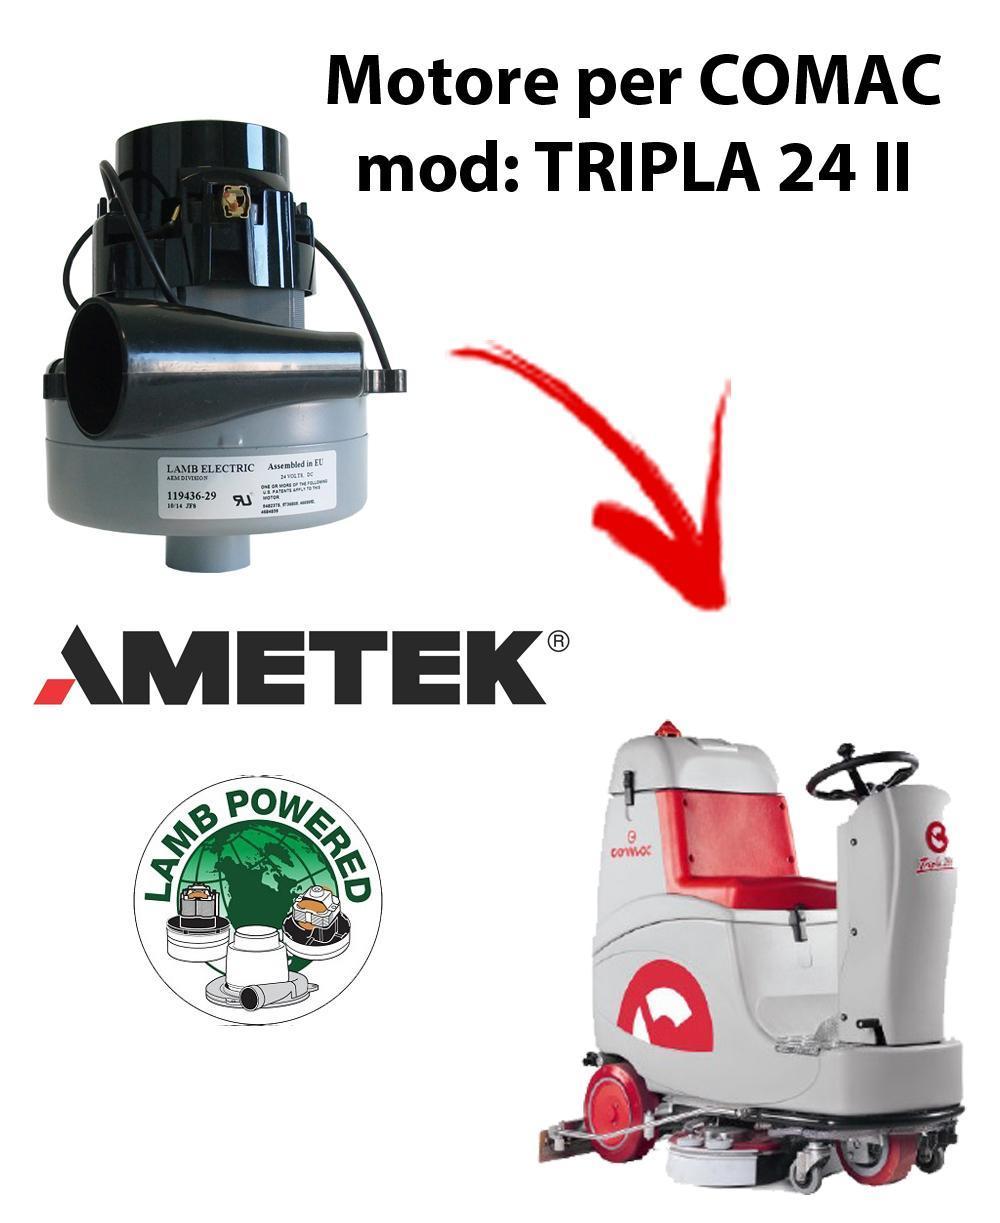 TRIPLA 24 II Motore de aspiración AMETEK para fregadora Comac